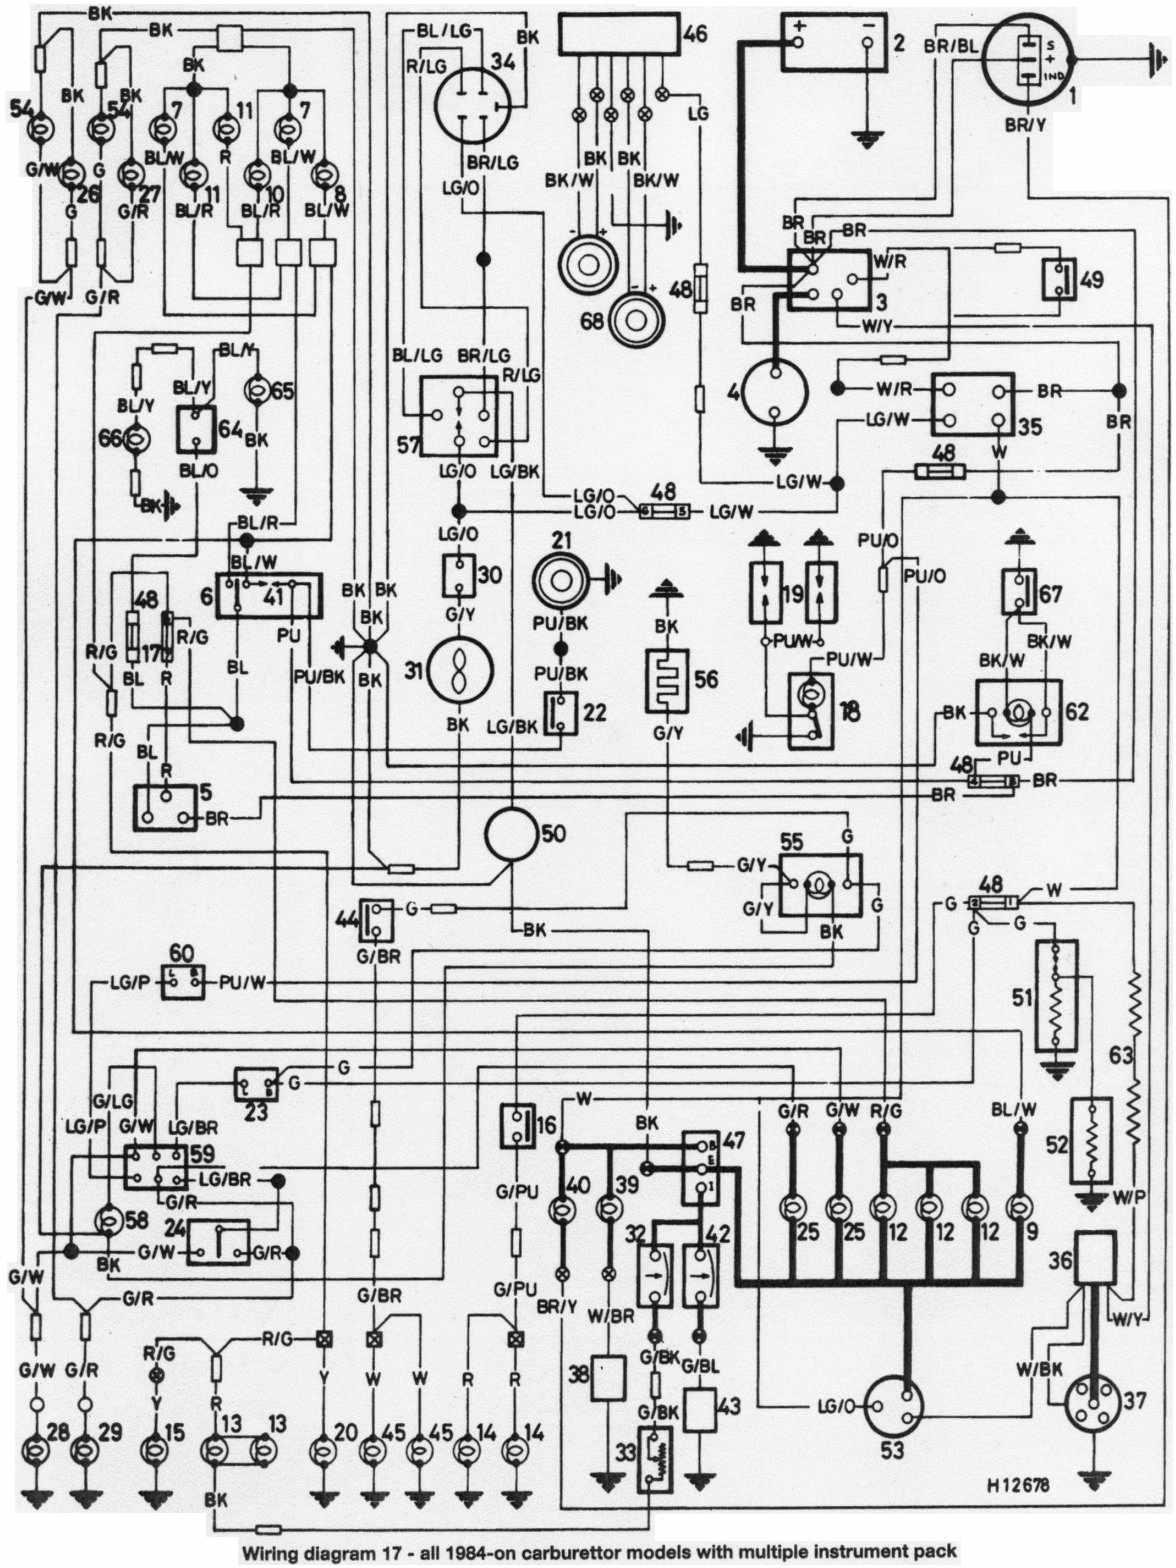 MINI - Car PDF Manual, Wiring Diagram & Fault Codes DTC | 2003 Mini Cooper S Wiring Schematic |  | CAR PDF Manuals & Fault Codes DTC